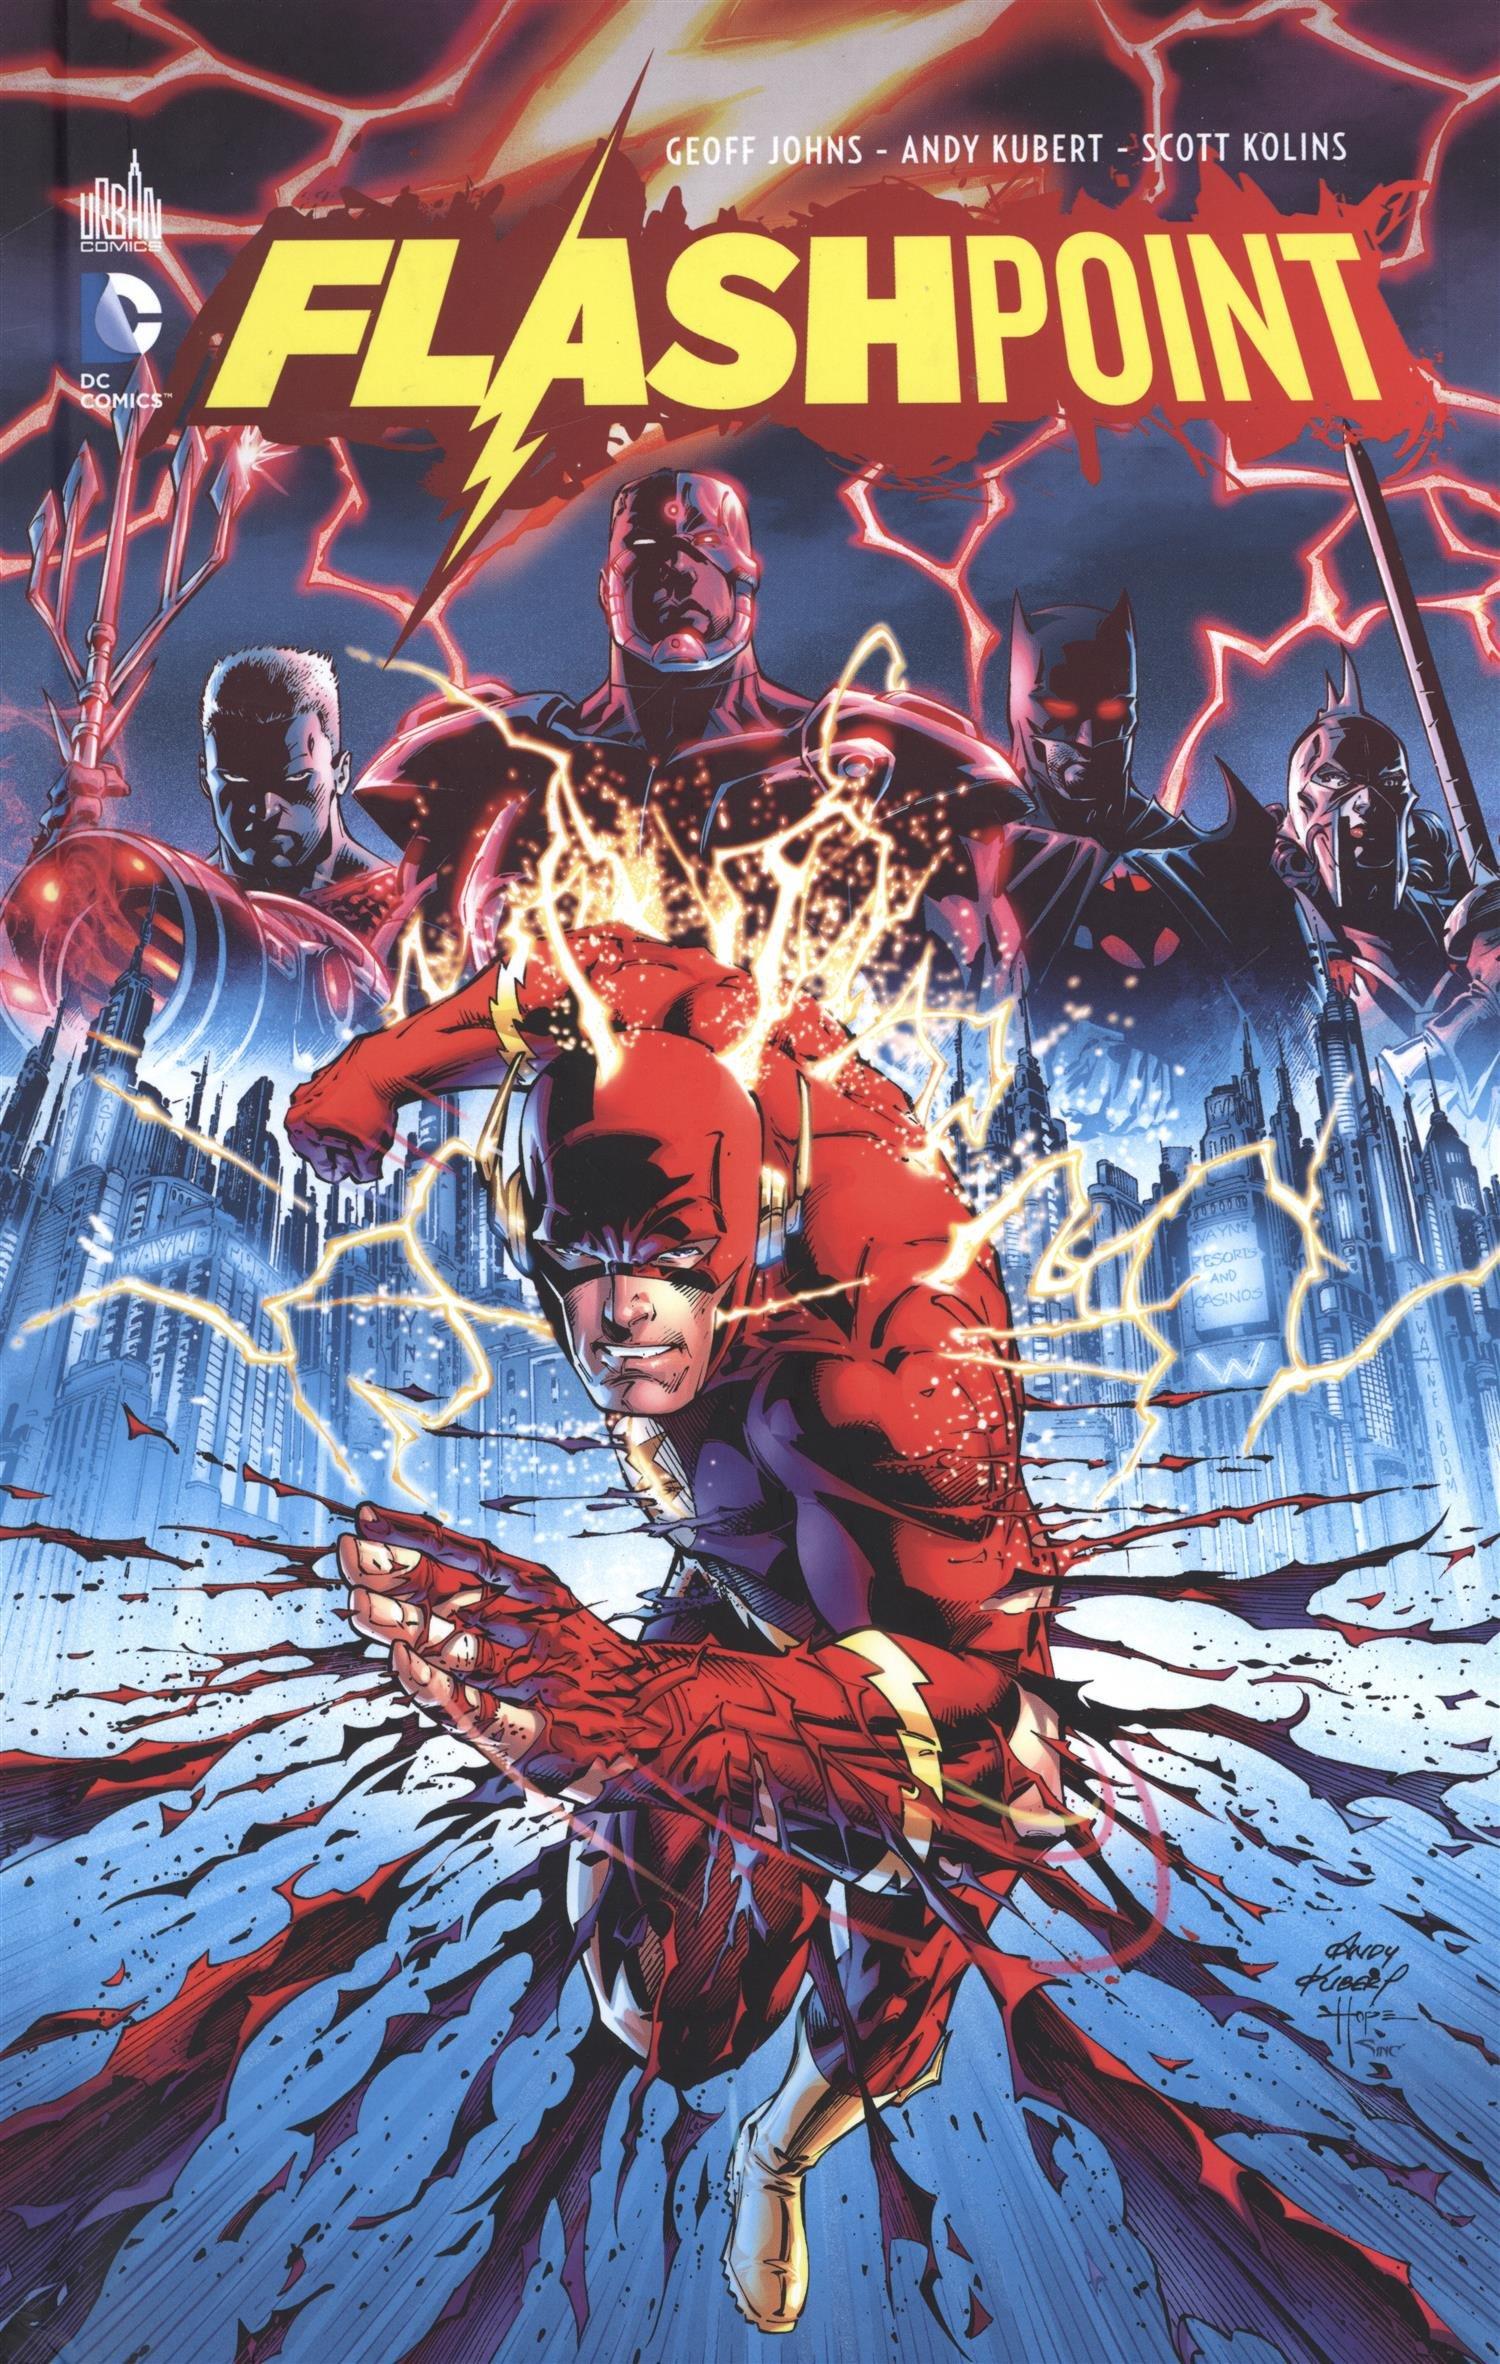 Flashpoint Album – 3 avril 2015 Johns Geoff Kubert Andy Urban Comics 2365777627